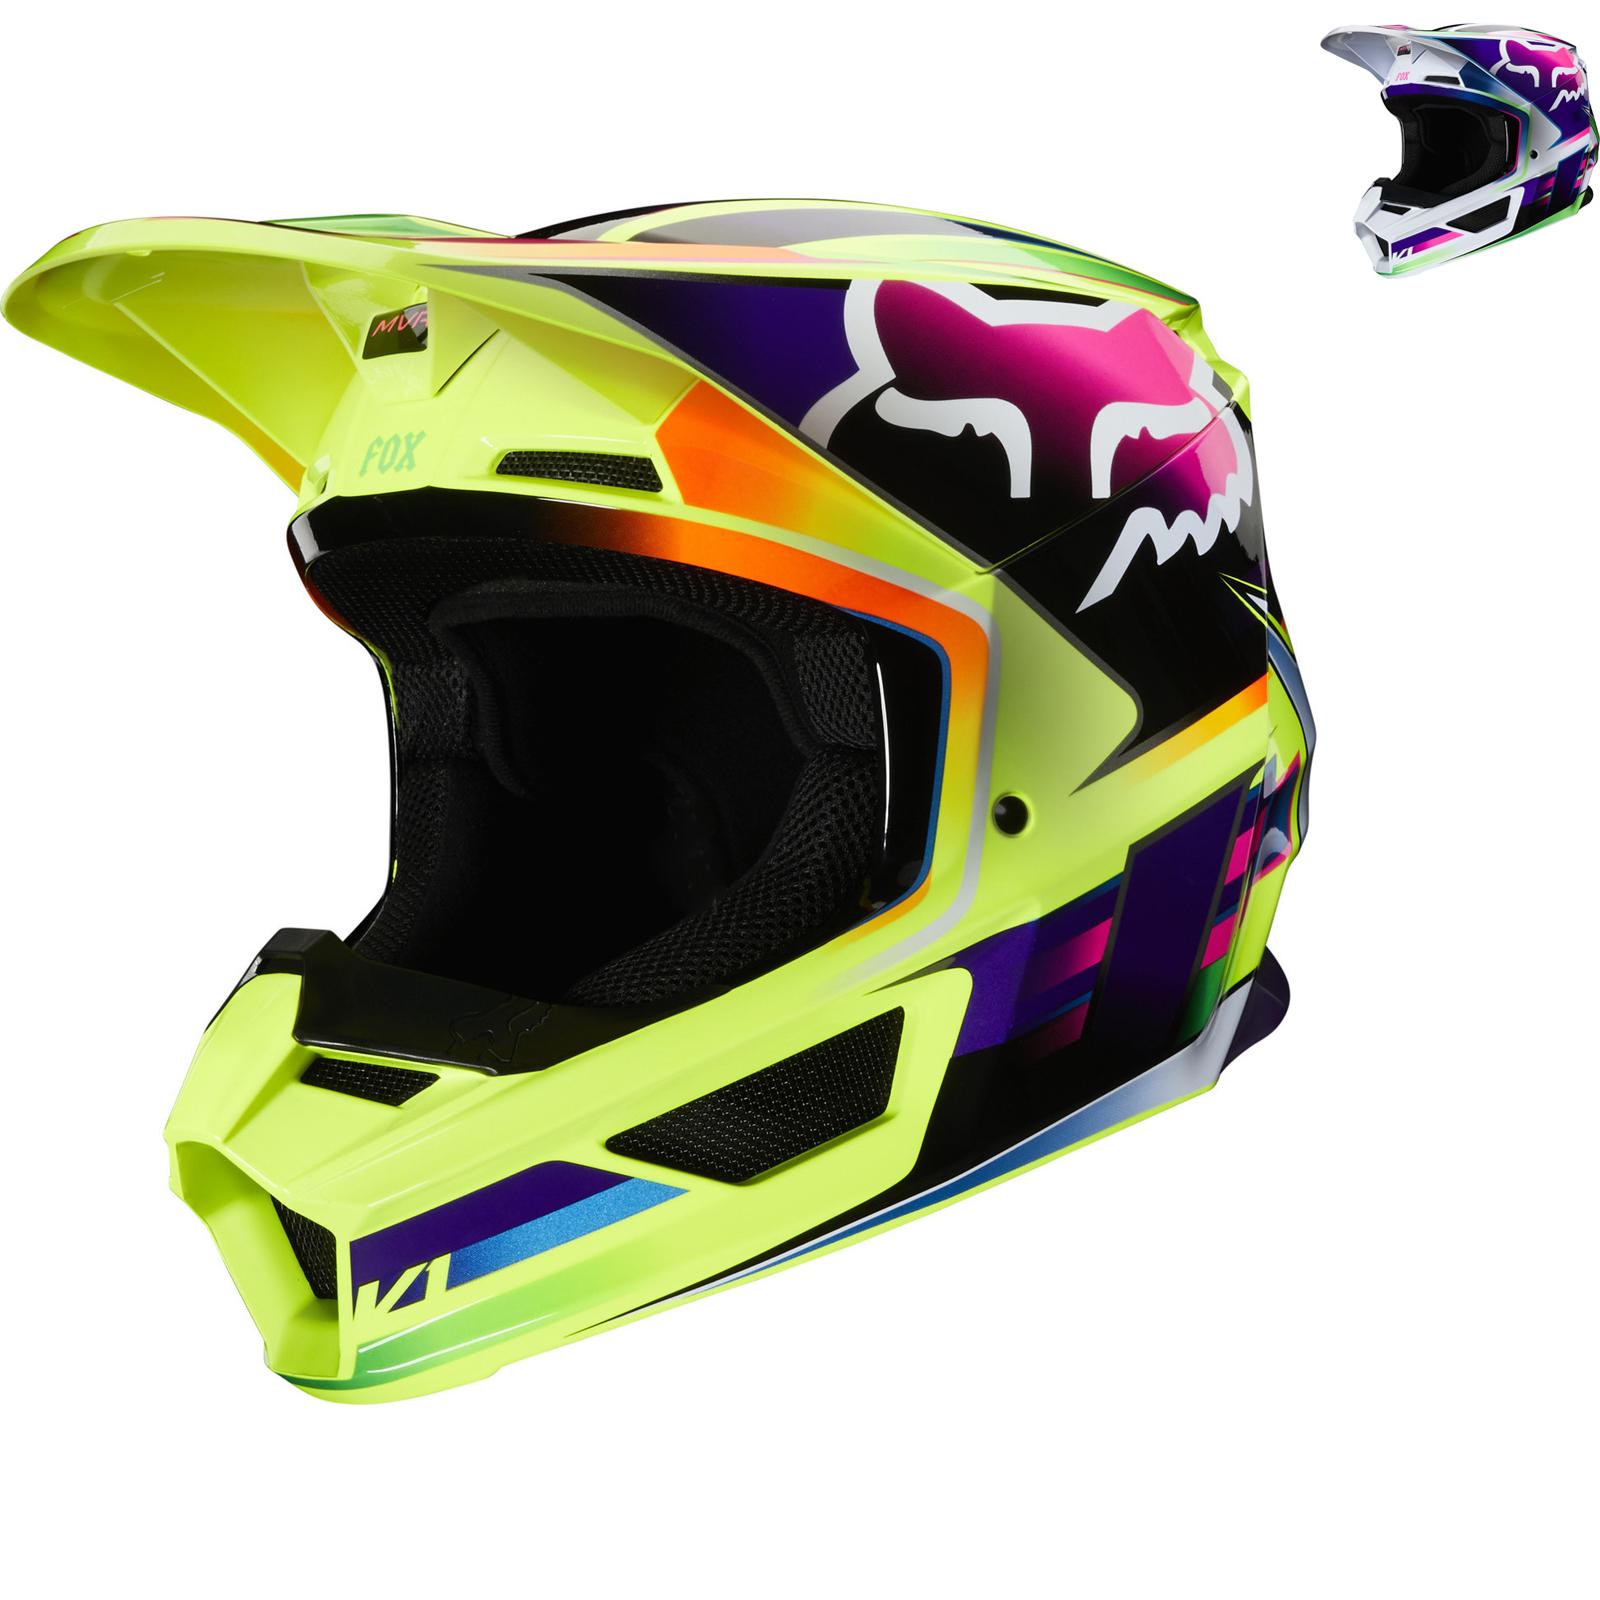 Fox Racing 2020 V1 Gama Motocross Helmet Helmets Ghostbikes Com